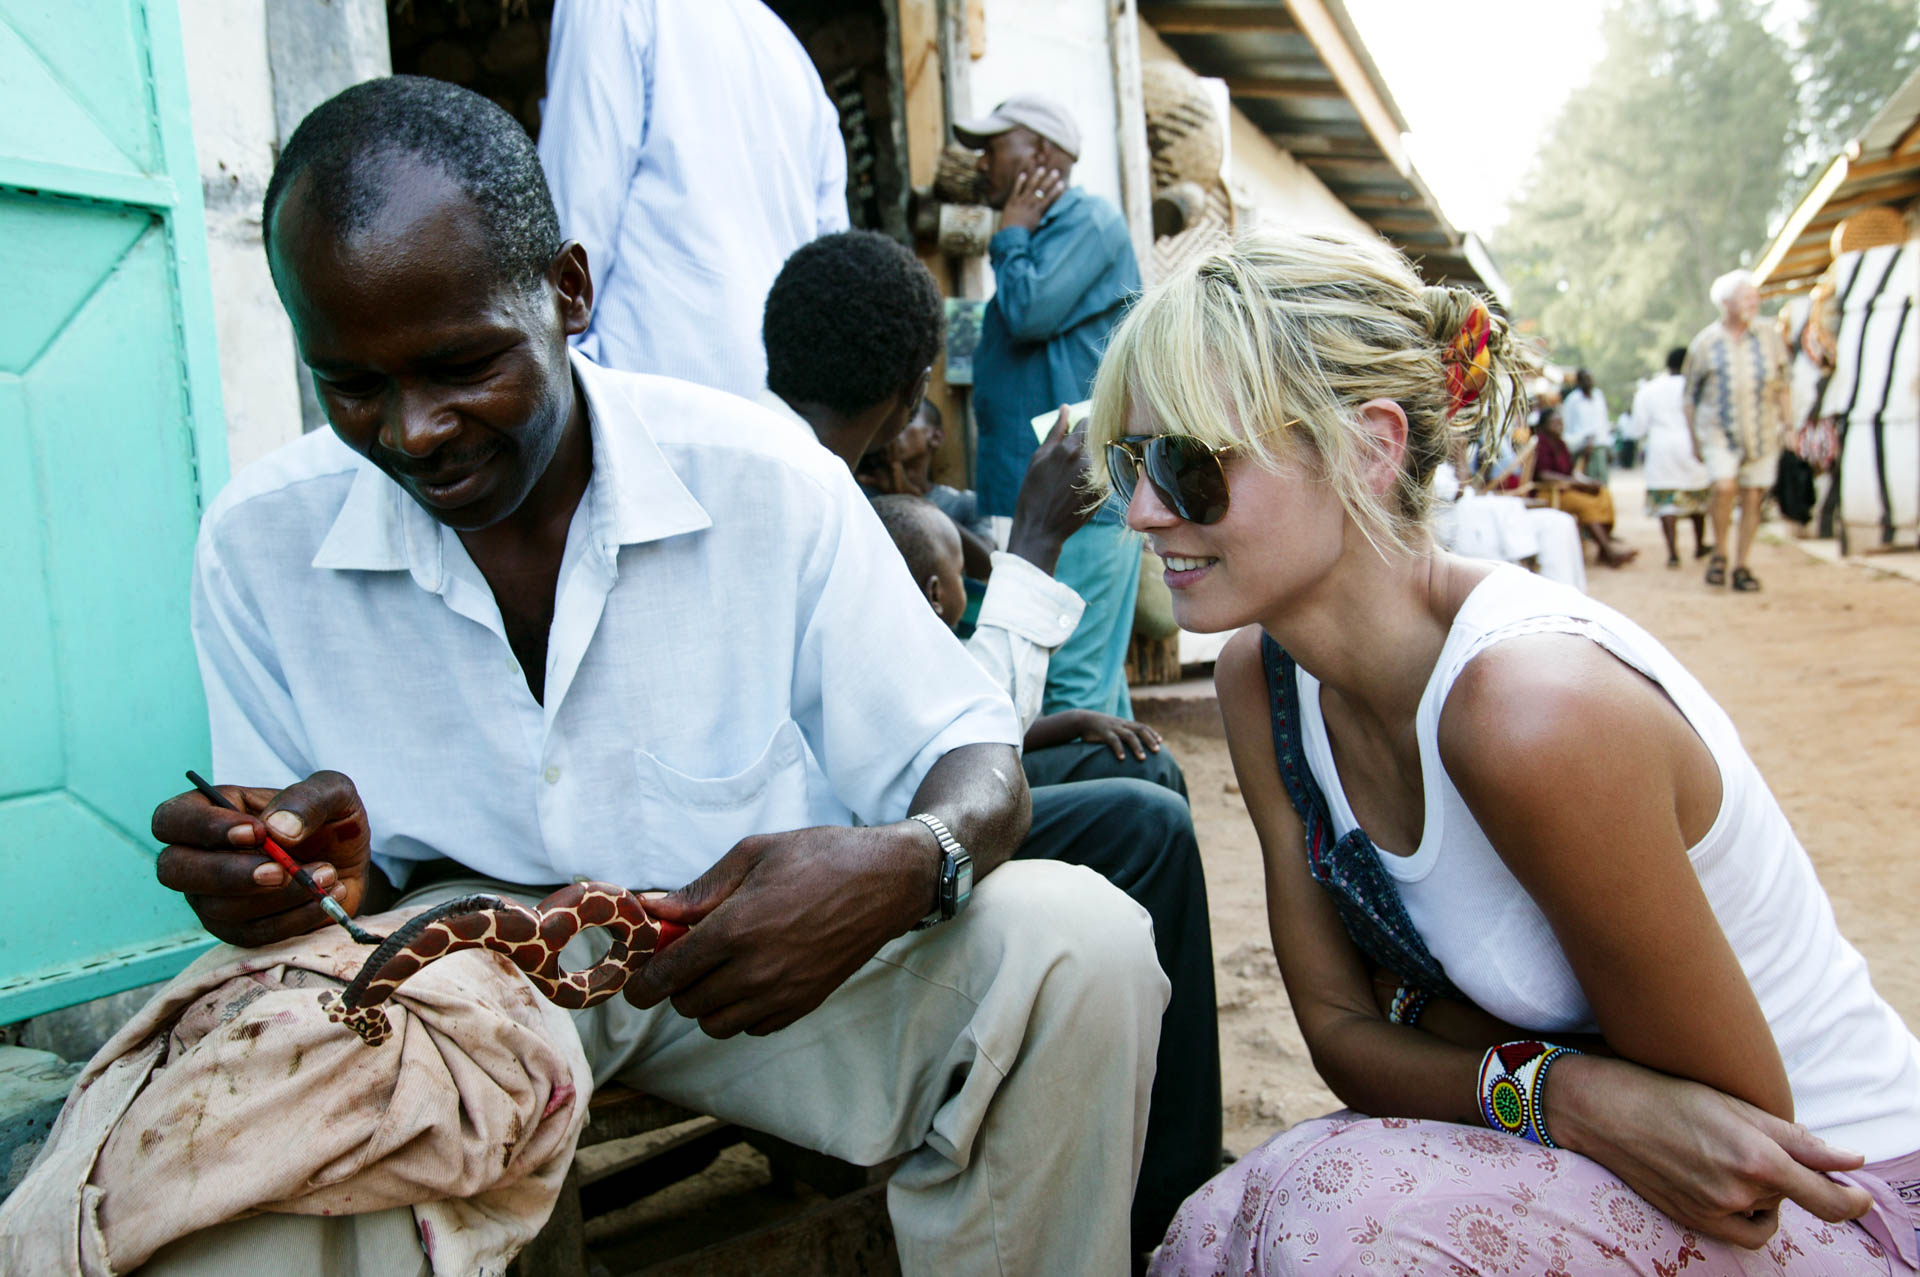 Heidi duing shopping in the market of Malindi.